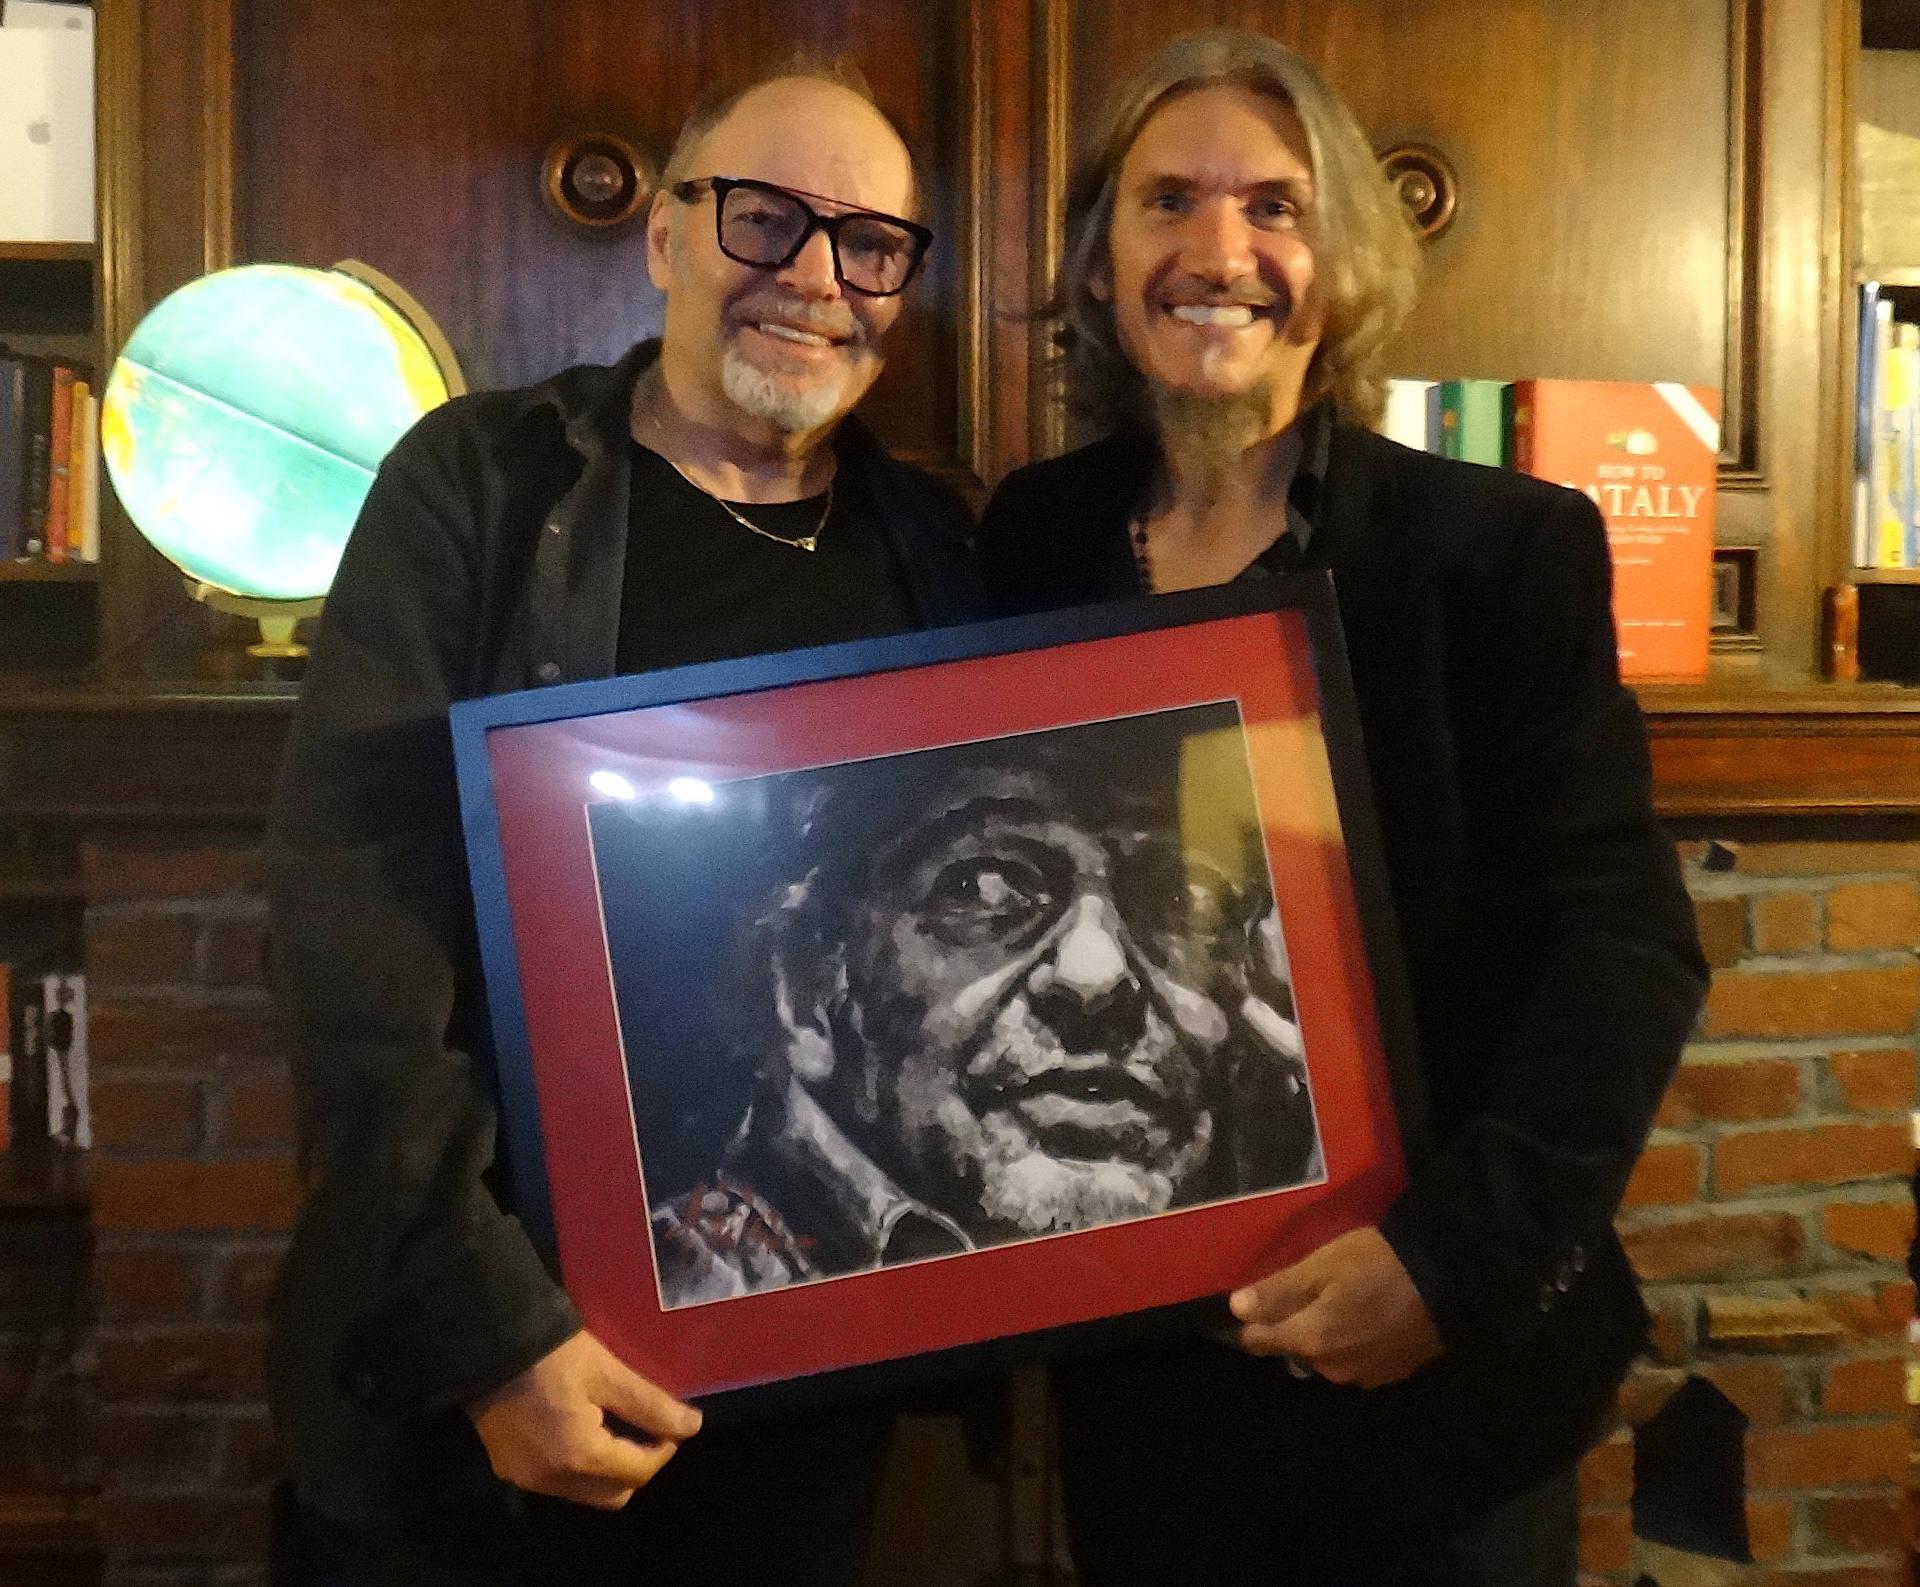 Vasco Rossi standing next to Fabian Perez holding portrait